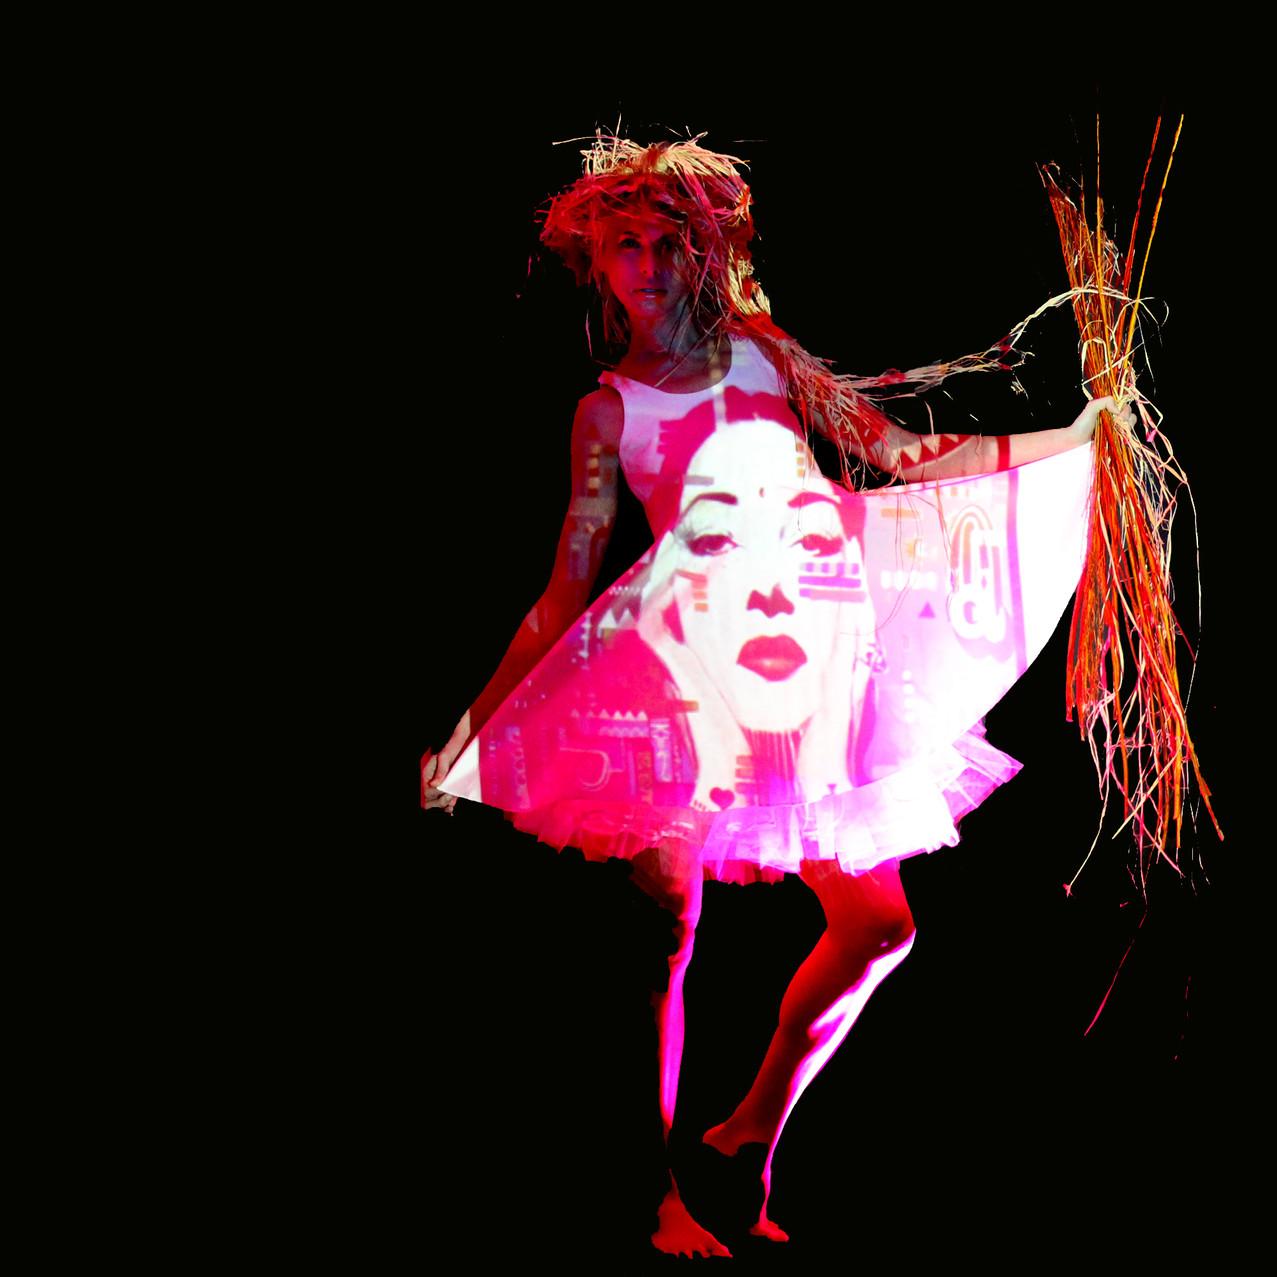 Layla Love Art Visionary Arts10_34.jpg